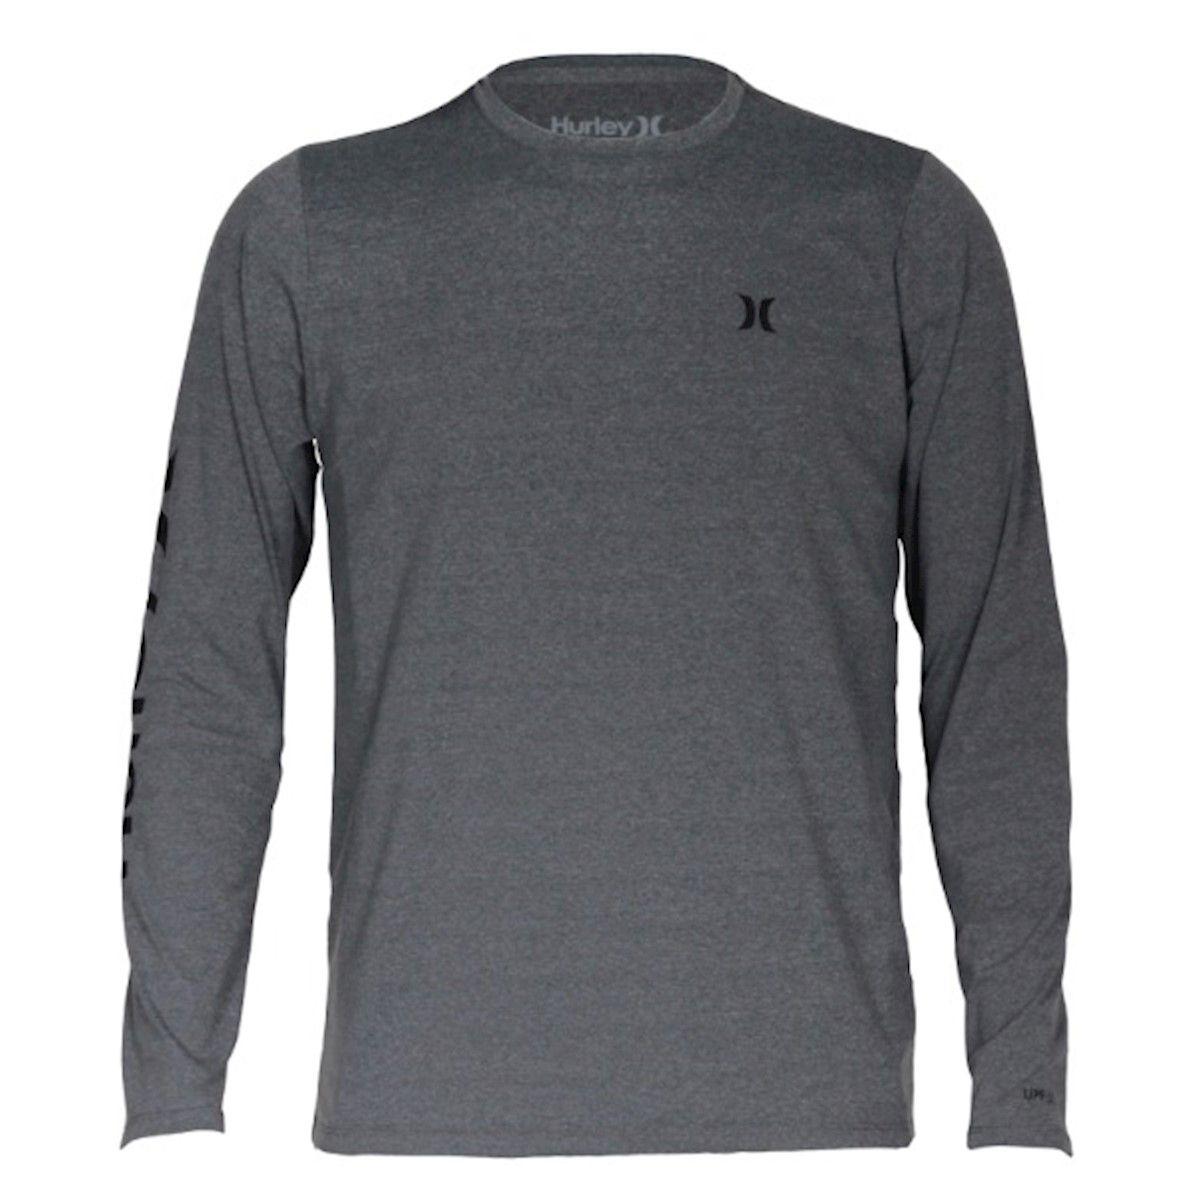 Camiseta de Lycra Hurley UV 50 Tee Strong